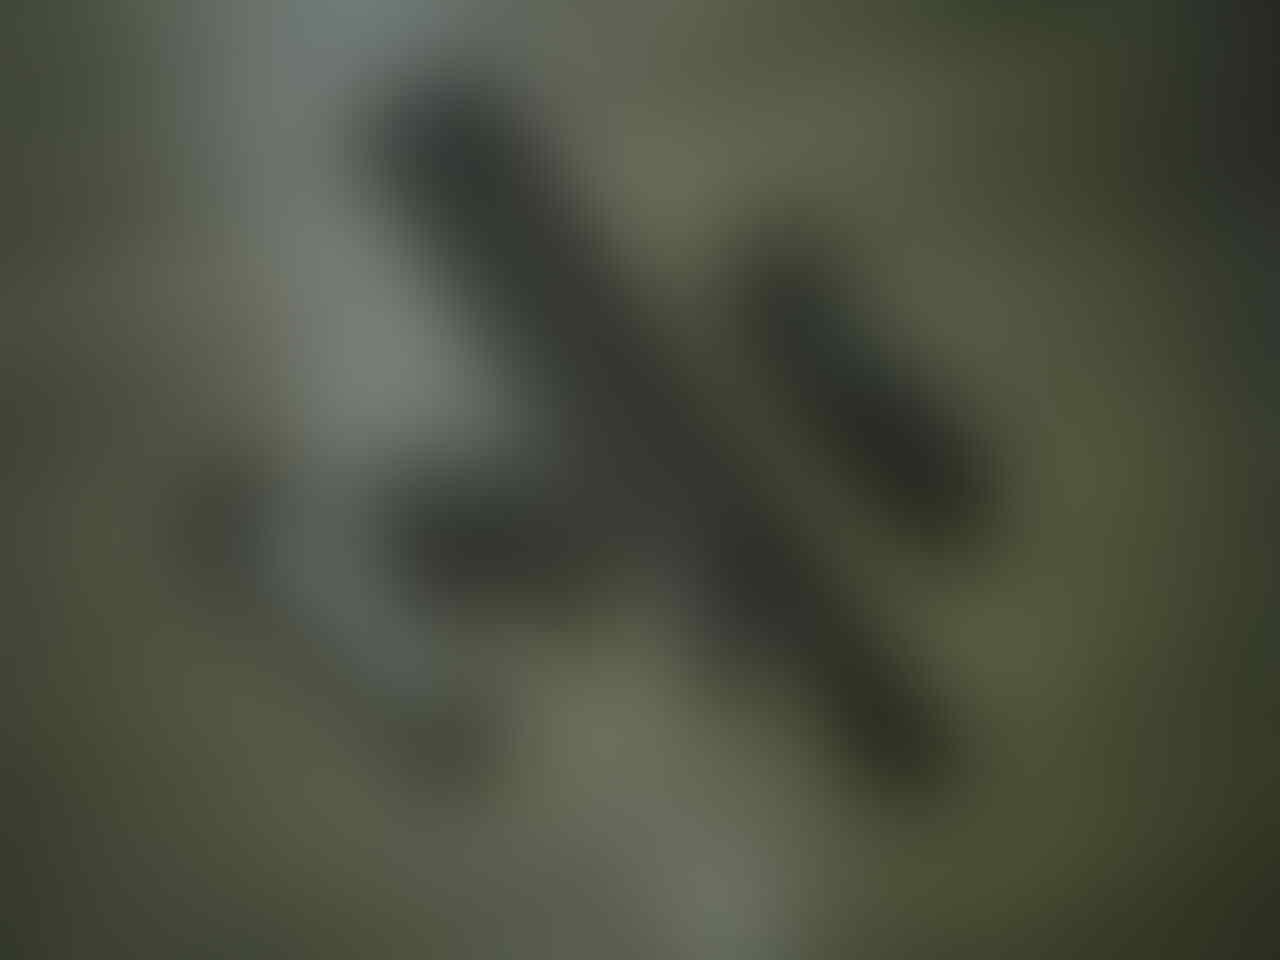 ►۩★★★ ۩ Stungun ALL Type FAST RESPON ۩★★★۩◄